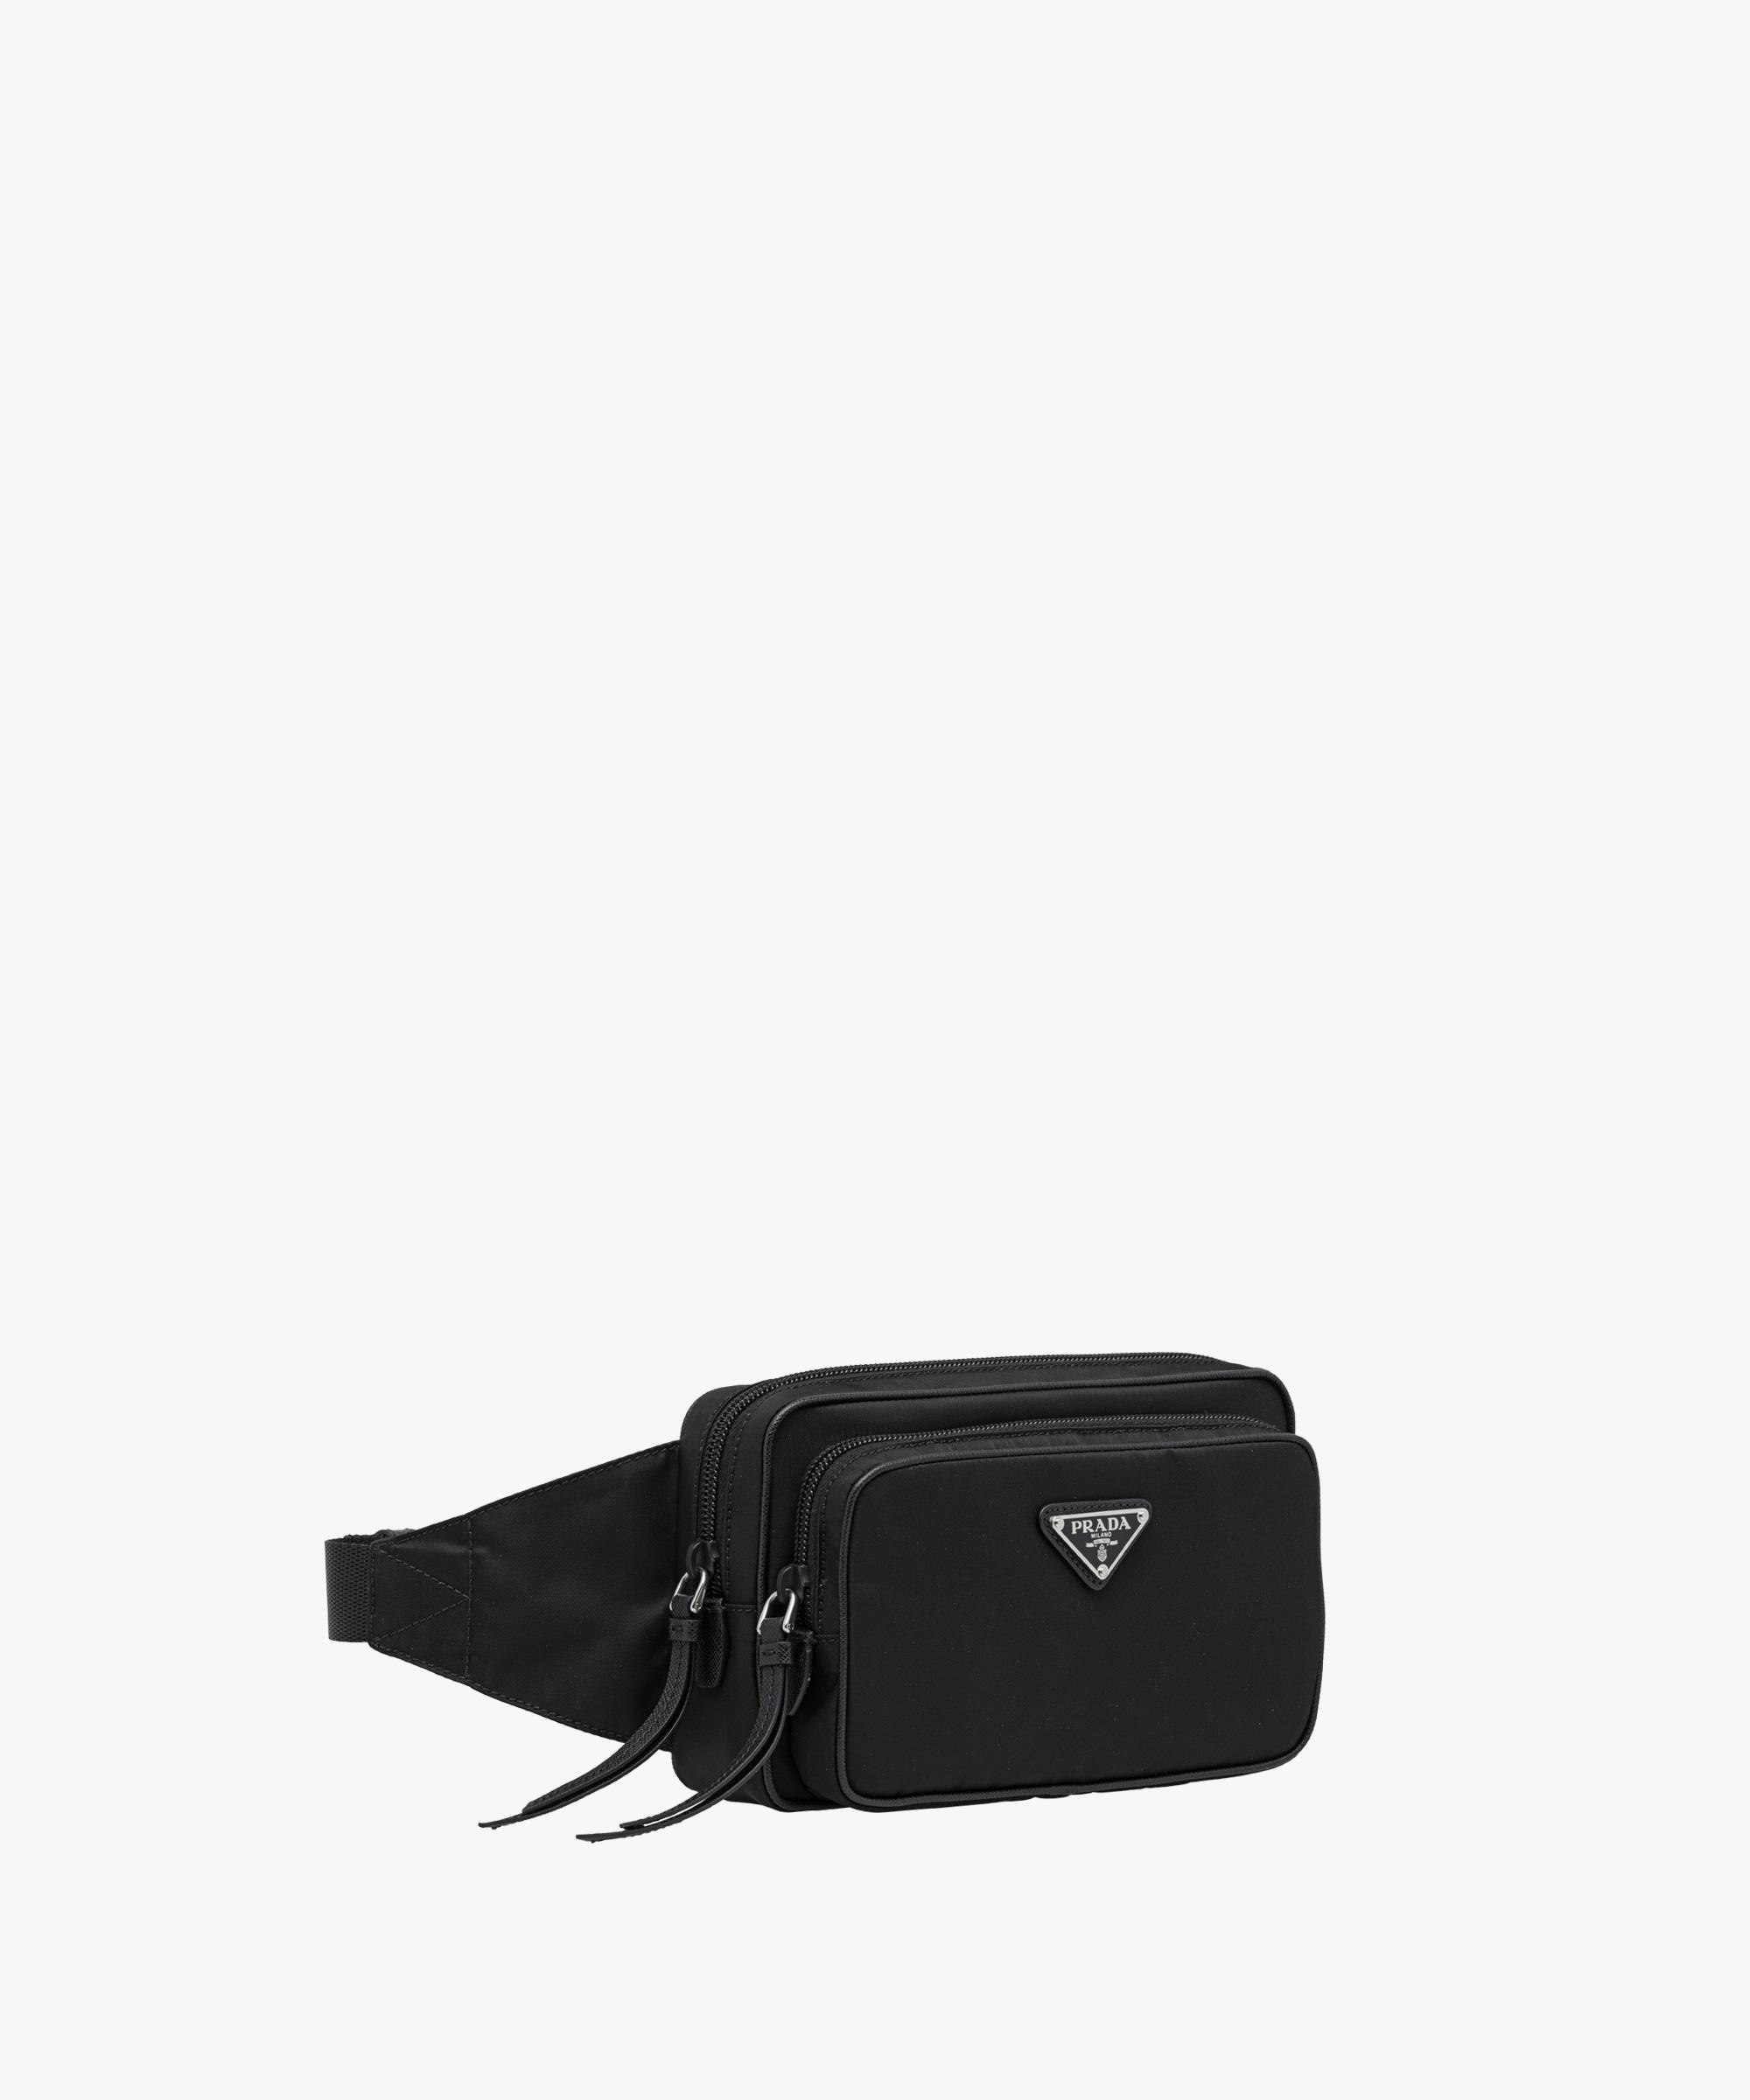 Nylon and leather belt bag Prada gpEV4Sp